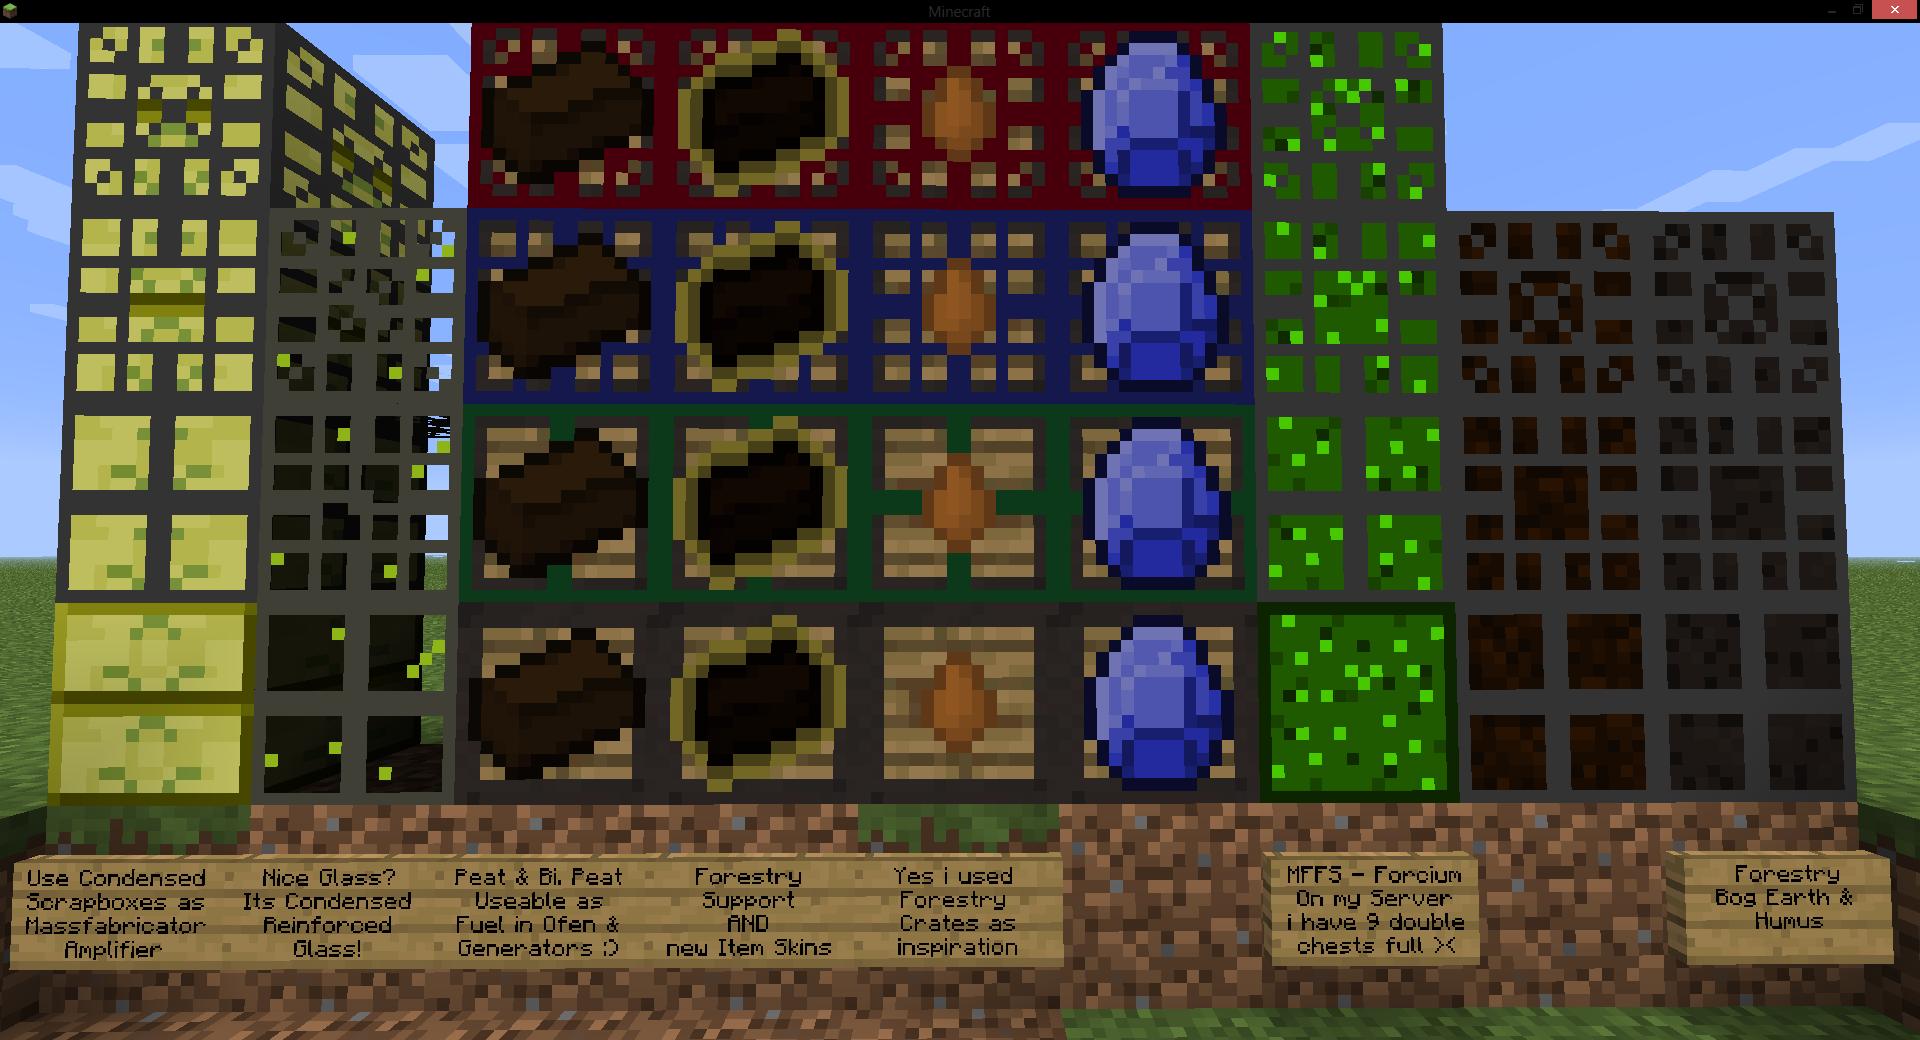 https://img.9minecraft.net/Mods/Condensed-Blocks-Mod-6.png